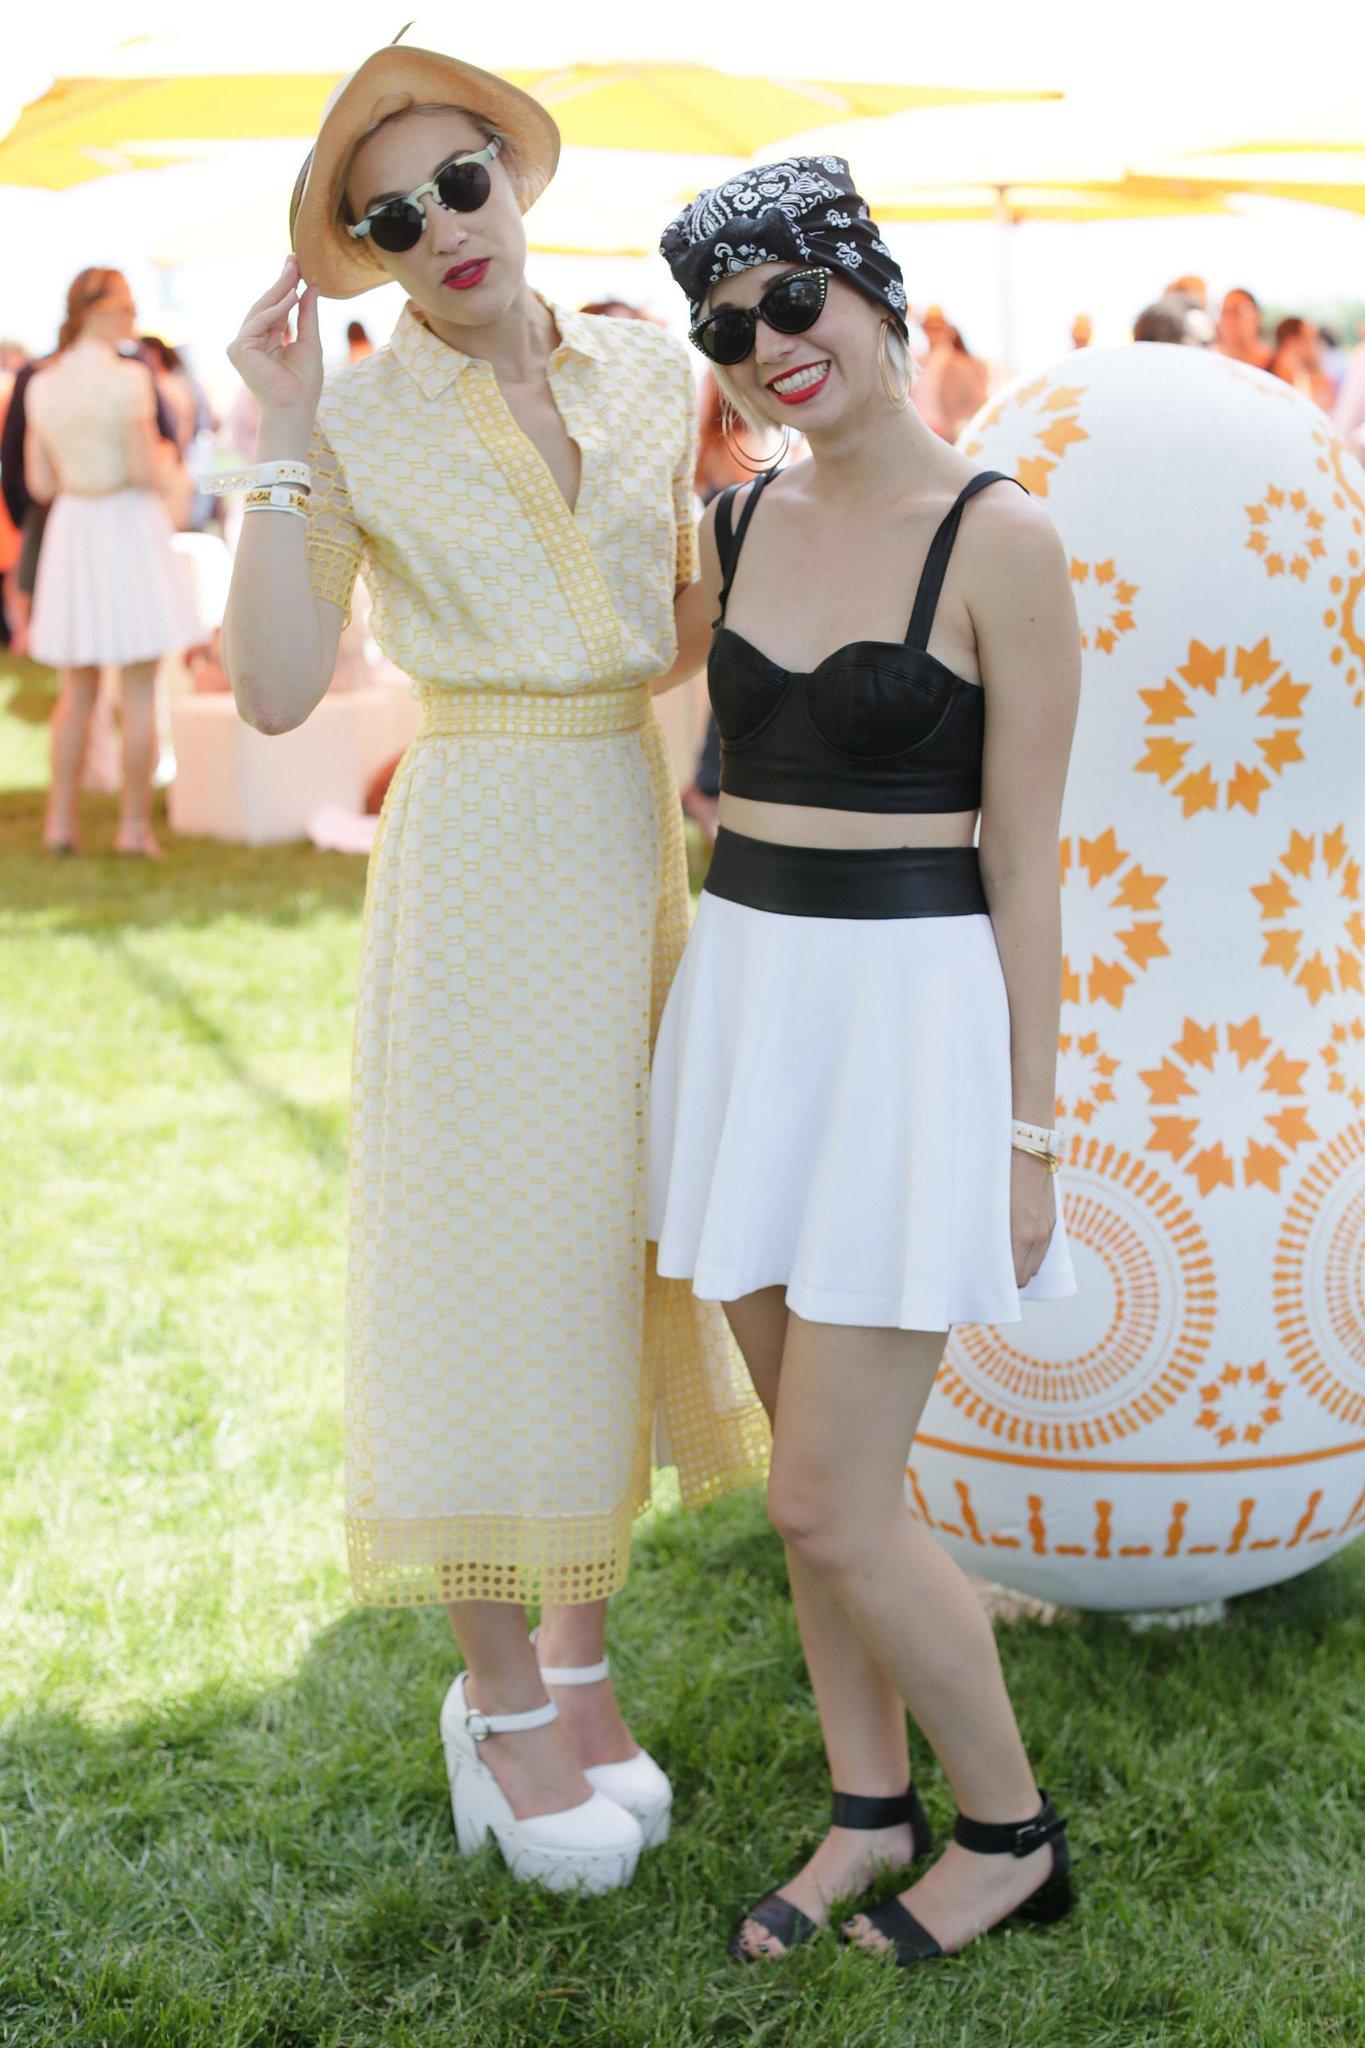 Mia Moretti and Caitlin Moe at the sixth annual Veuve C